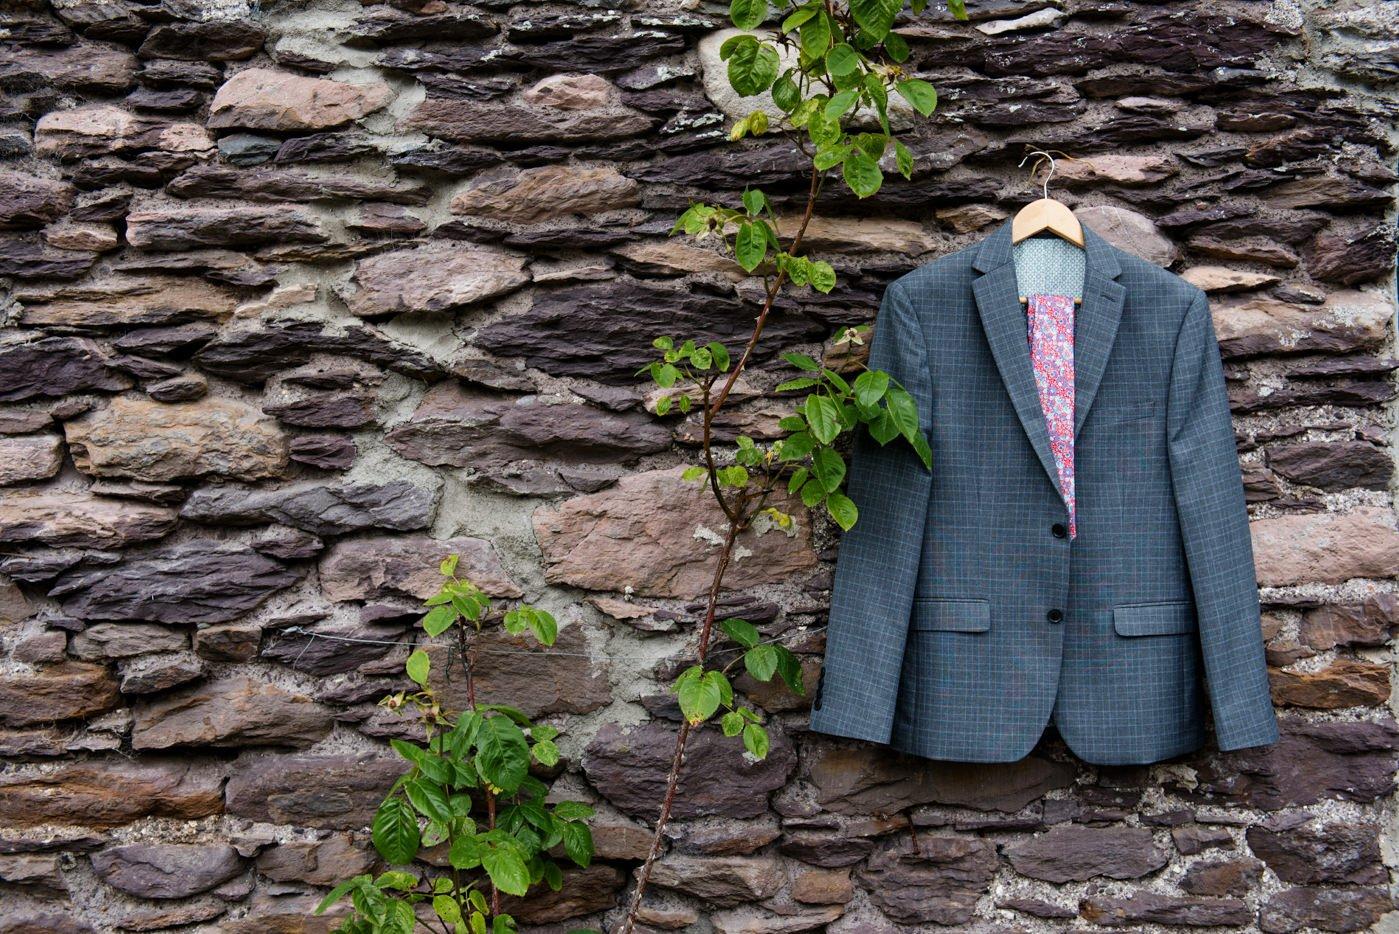 Suit hanging pre-wedding photography Co Kerry Ireland